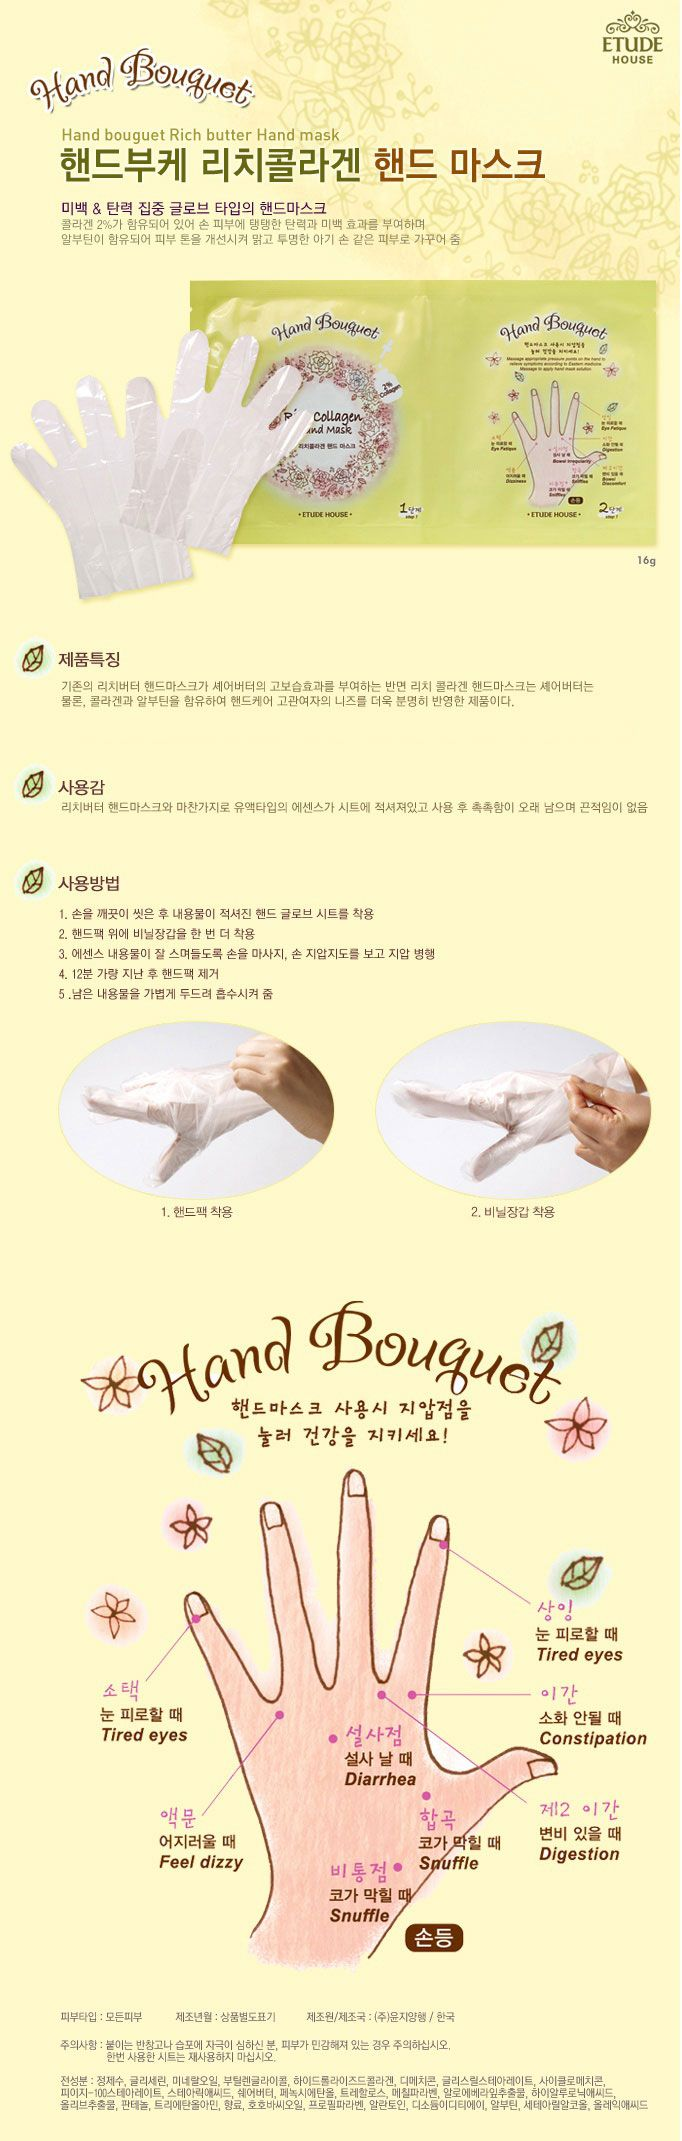 Etude House Korea Jakarta: Etude House Hand Bouquet Rich Collagen Hand Mask 1...